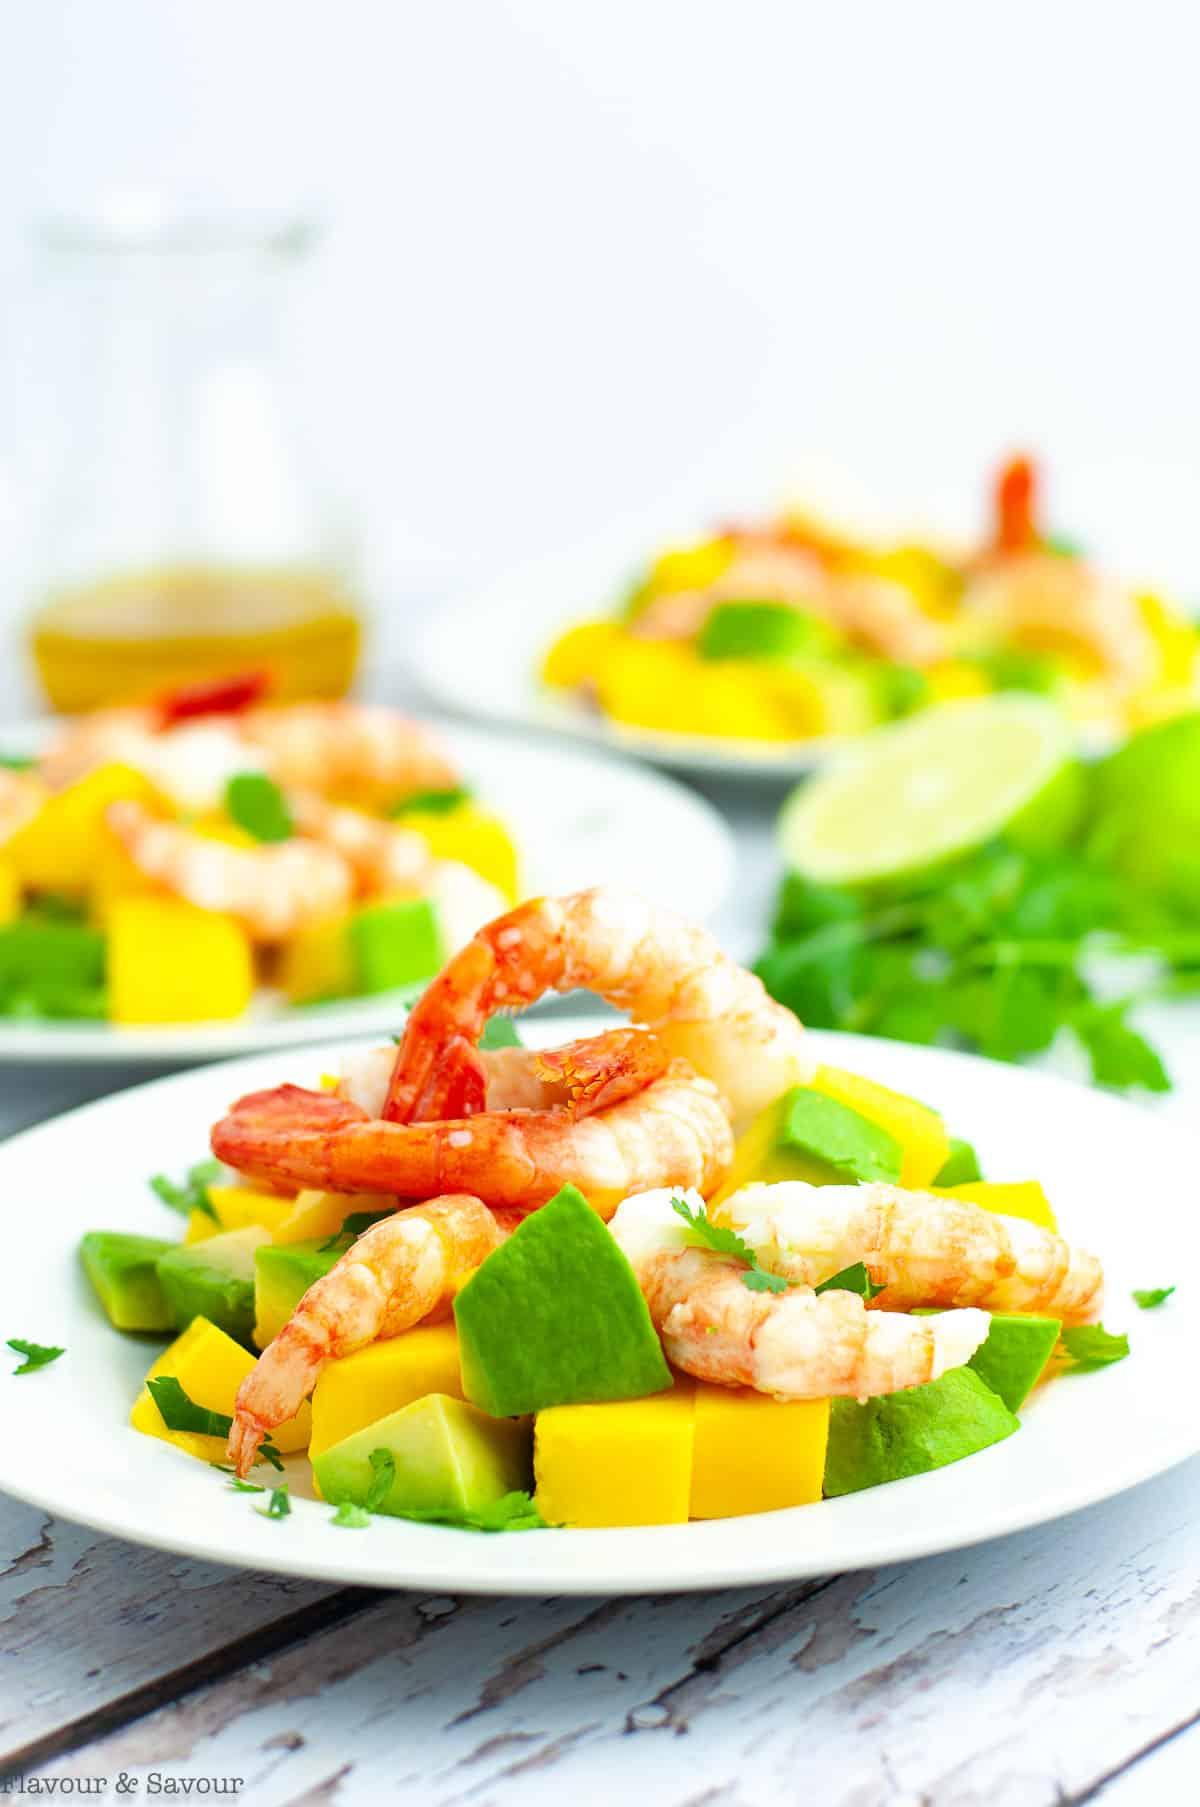 Three plates of Prawn Mango Avocado Salad